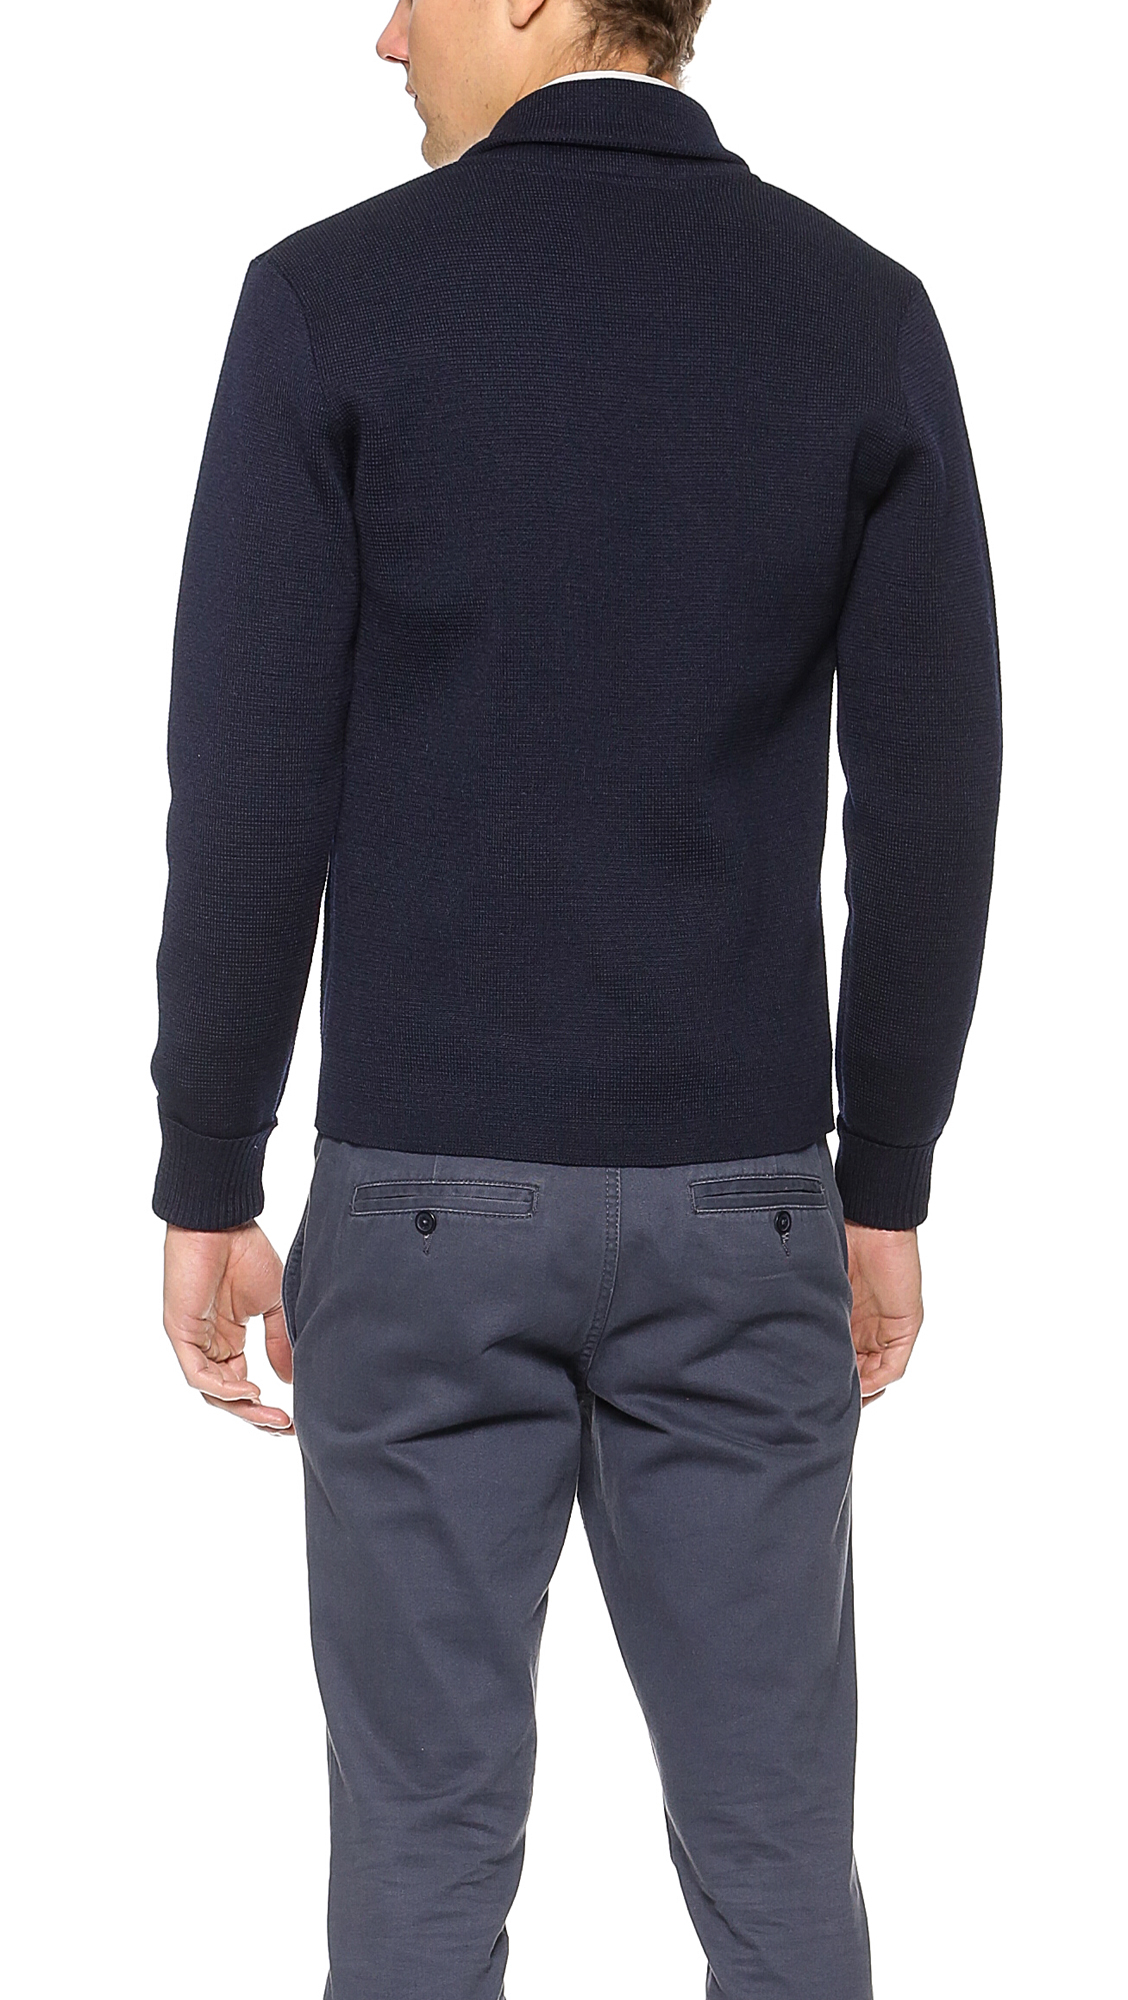 Arpenteur Roscoff Jacket in Navy (Blue) for Men